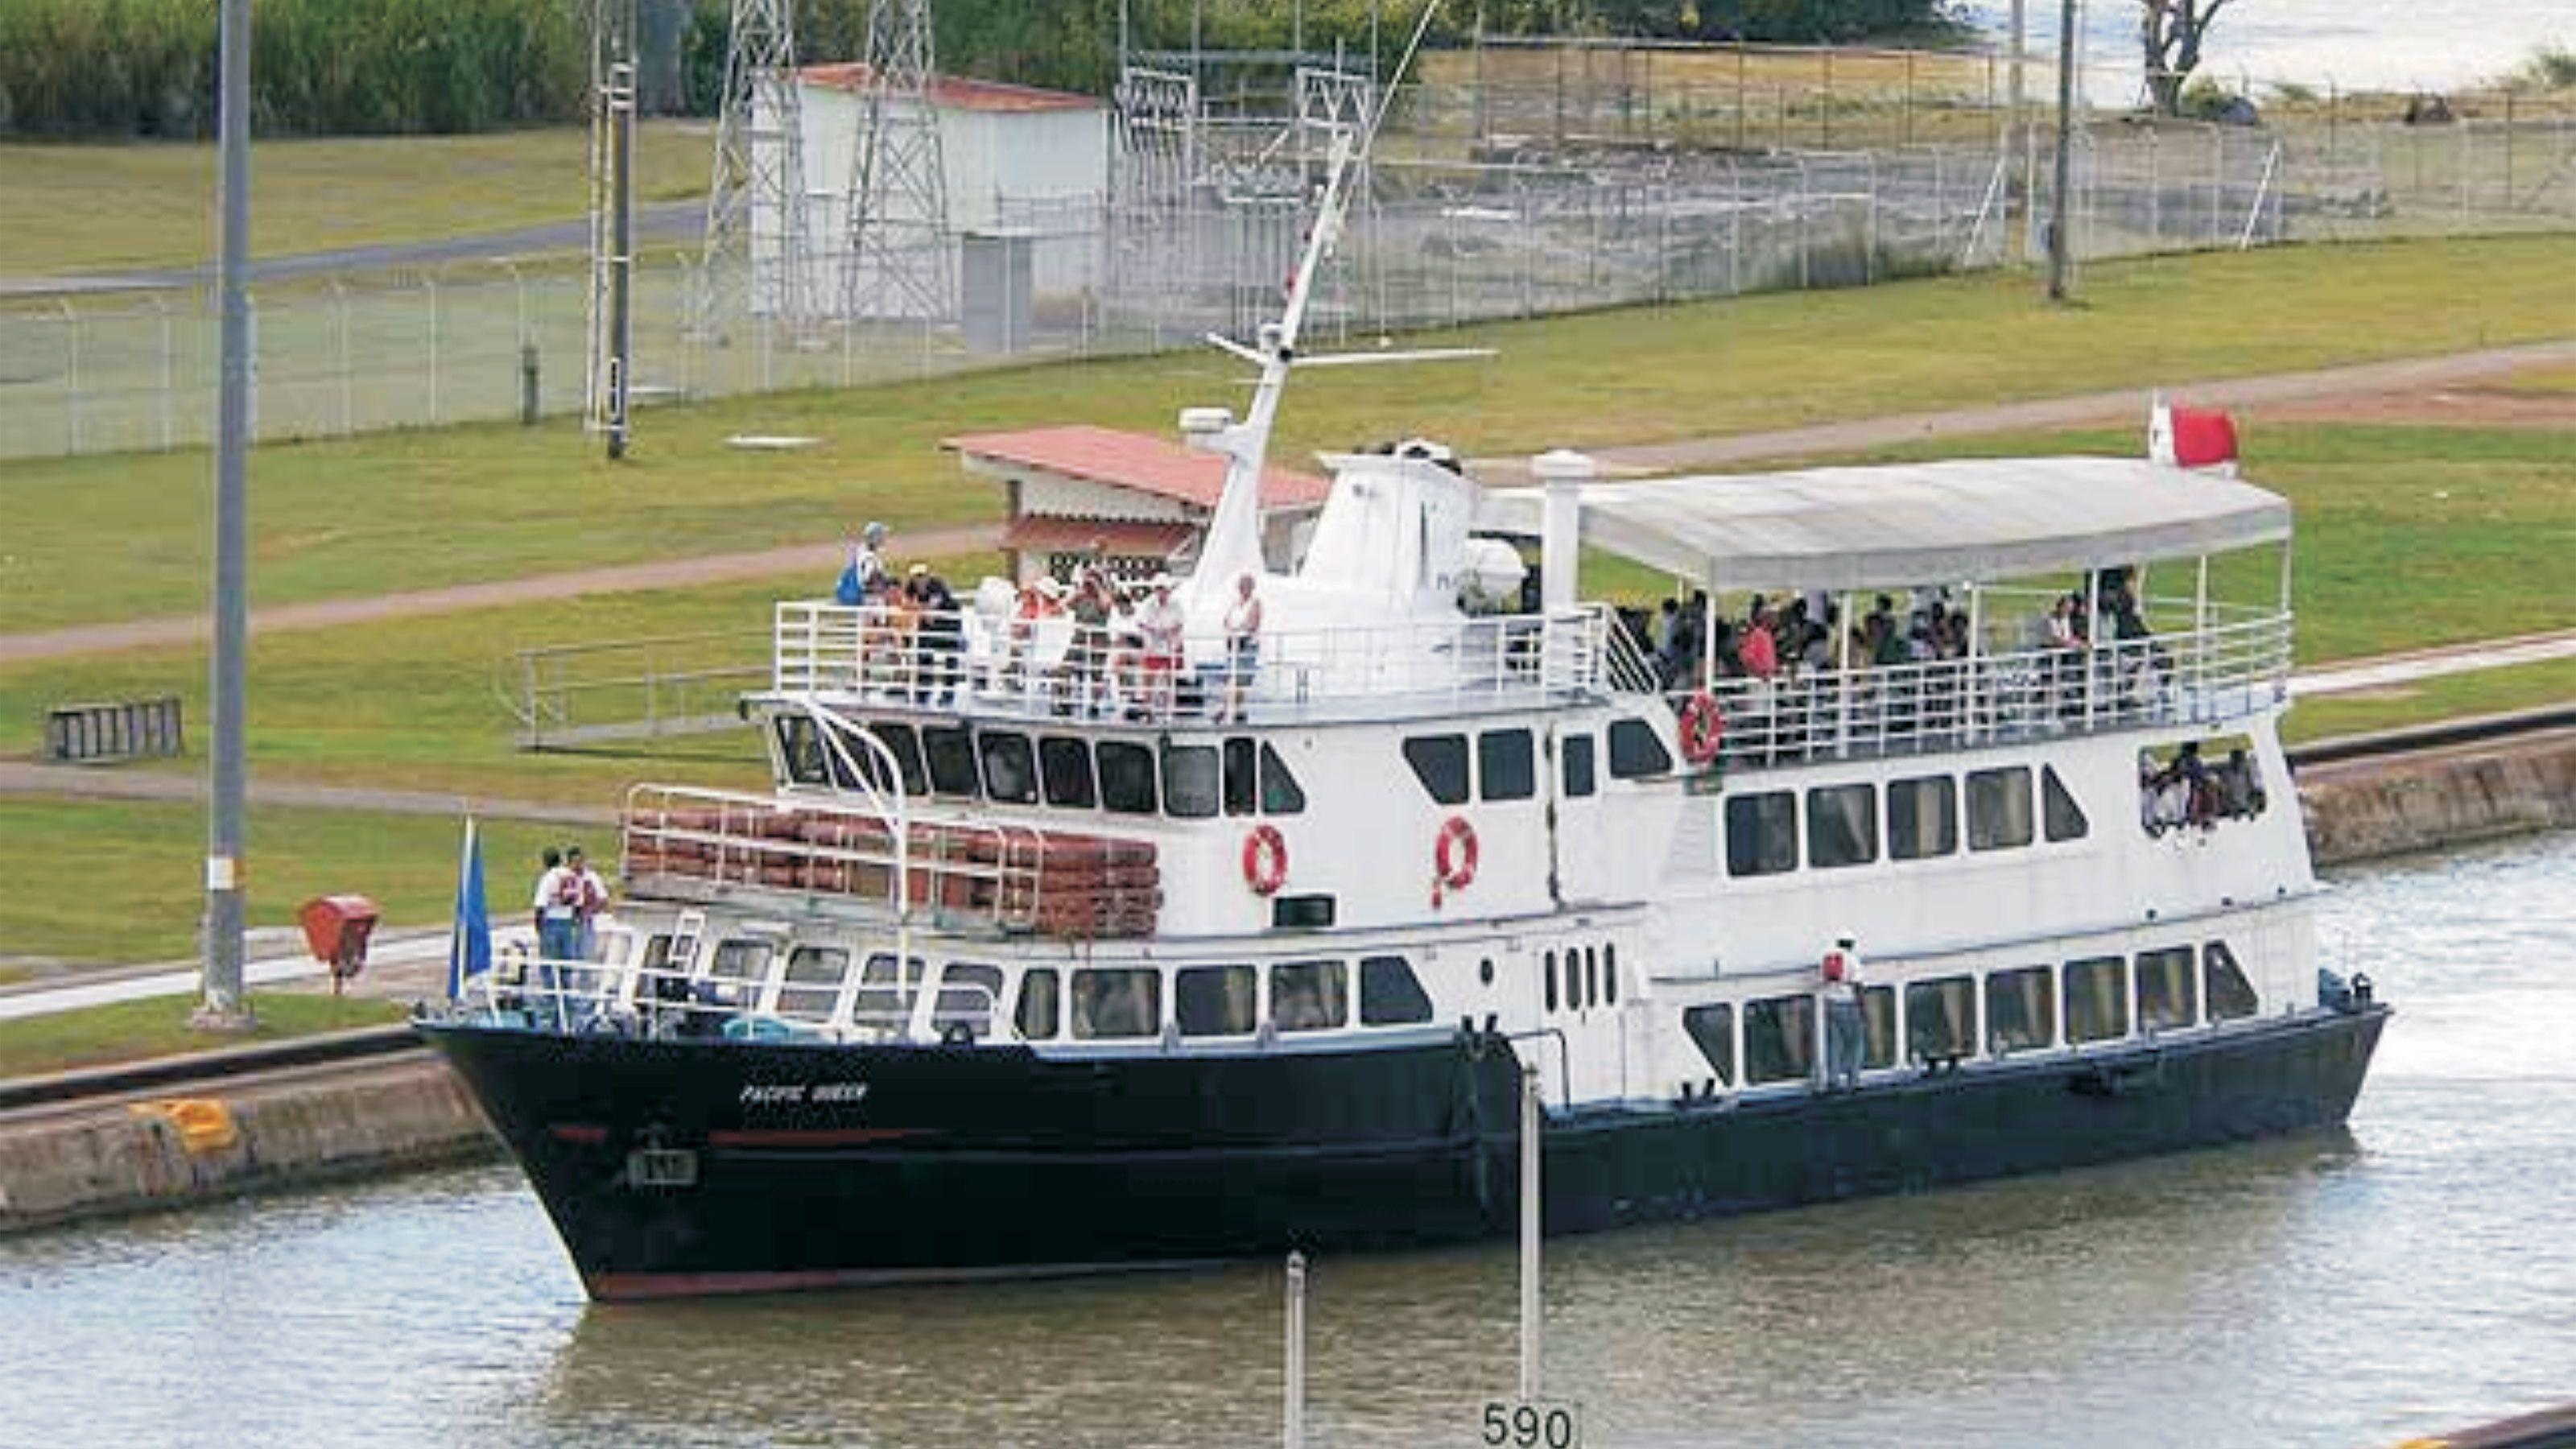 Partial Panama Canal Cruise through the Locks